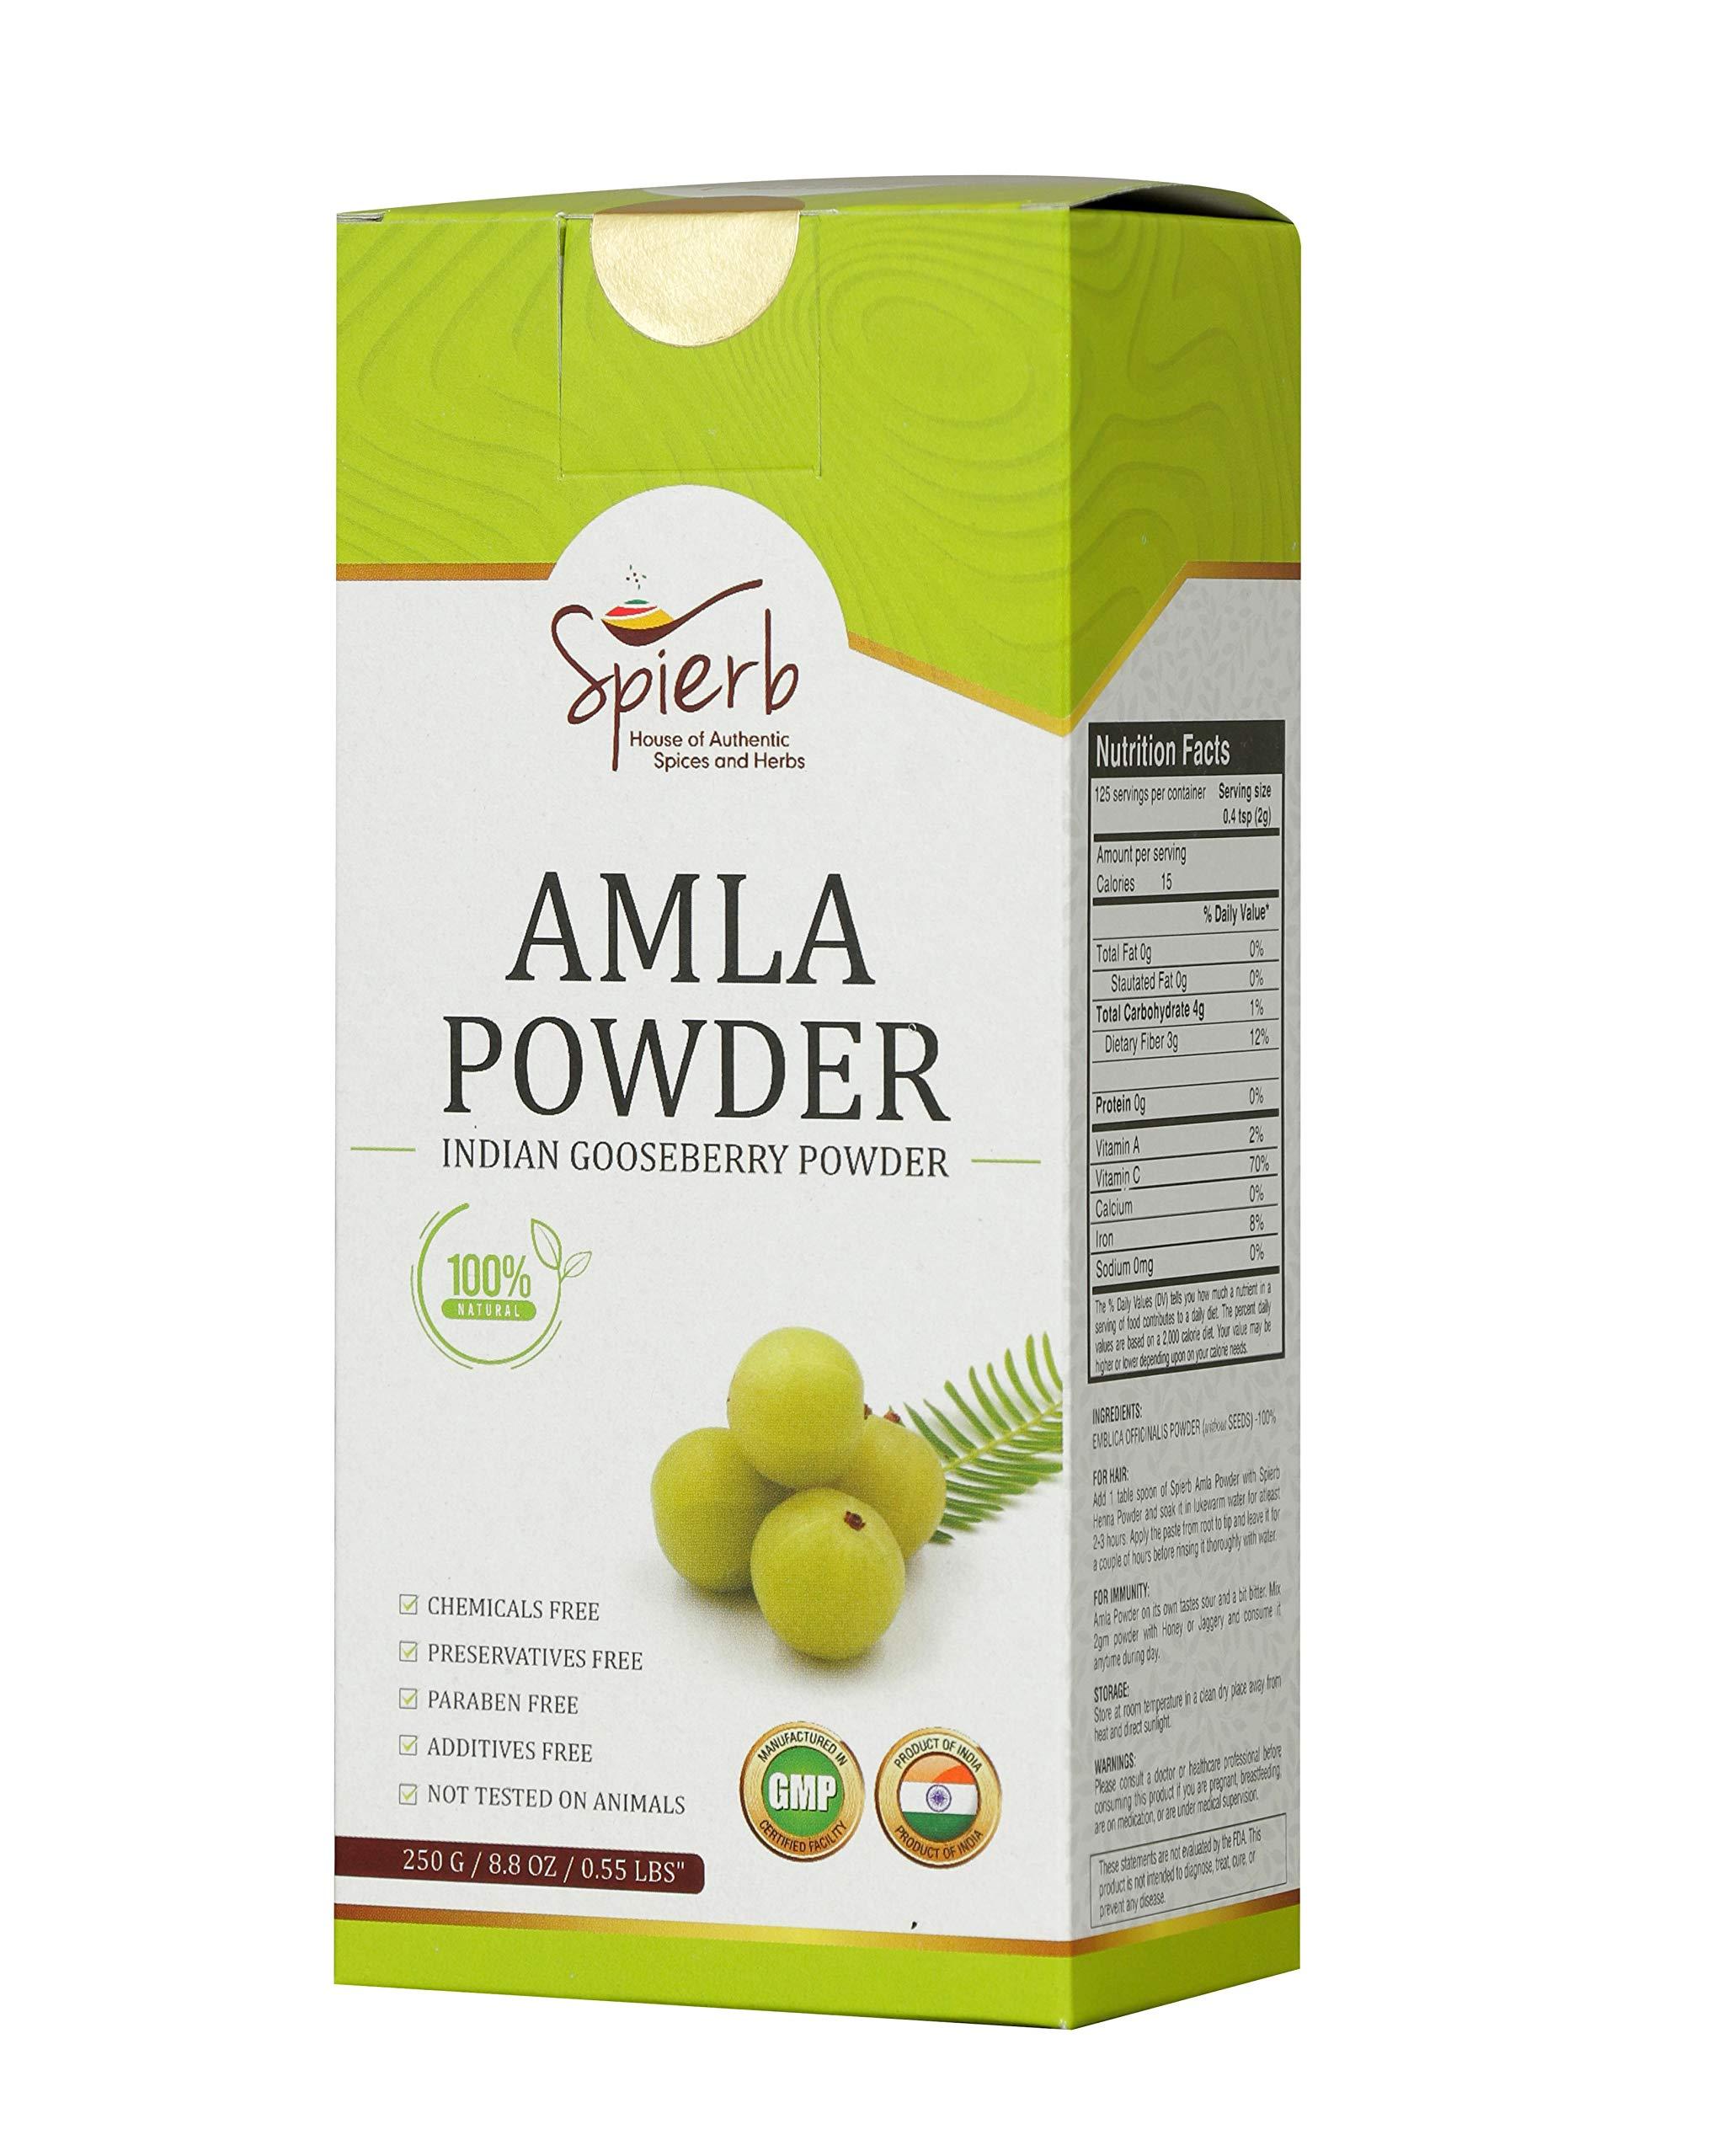 Spierb Amla Powder - Immunity Enhancer Keto-Friendly Indian Gooseberry Powder Super Food   Non-Irradiated Amla Powder for Hair Growth Without Preservatives   Pure Phyllanthus/Amalaki